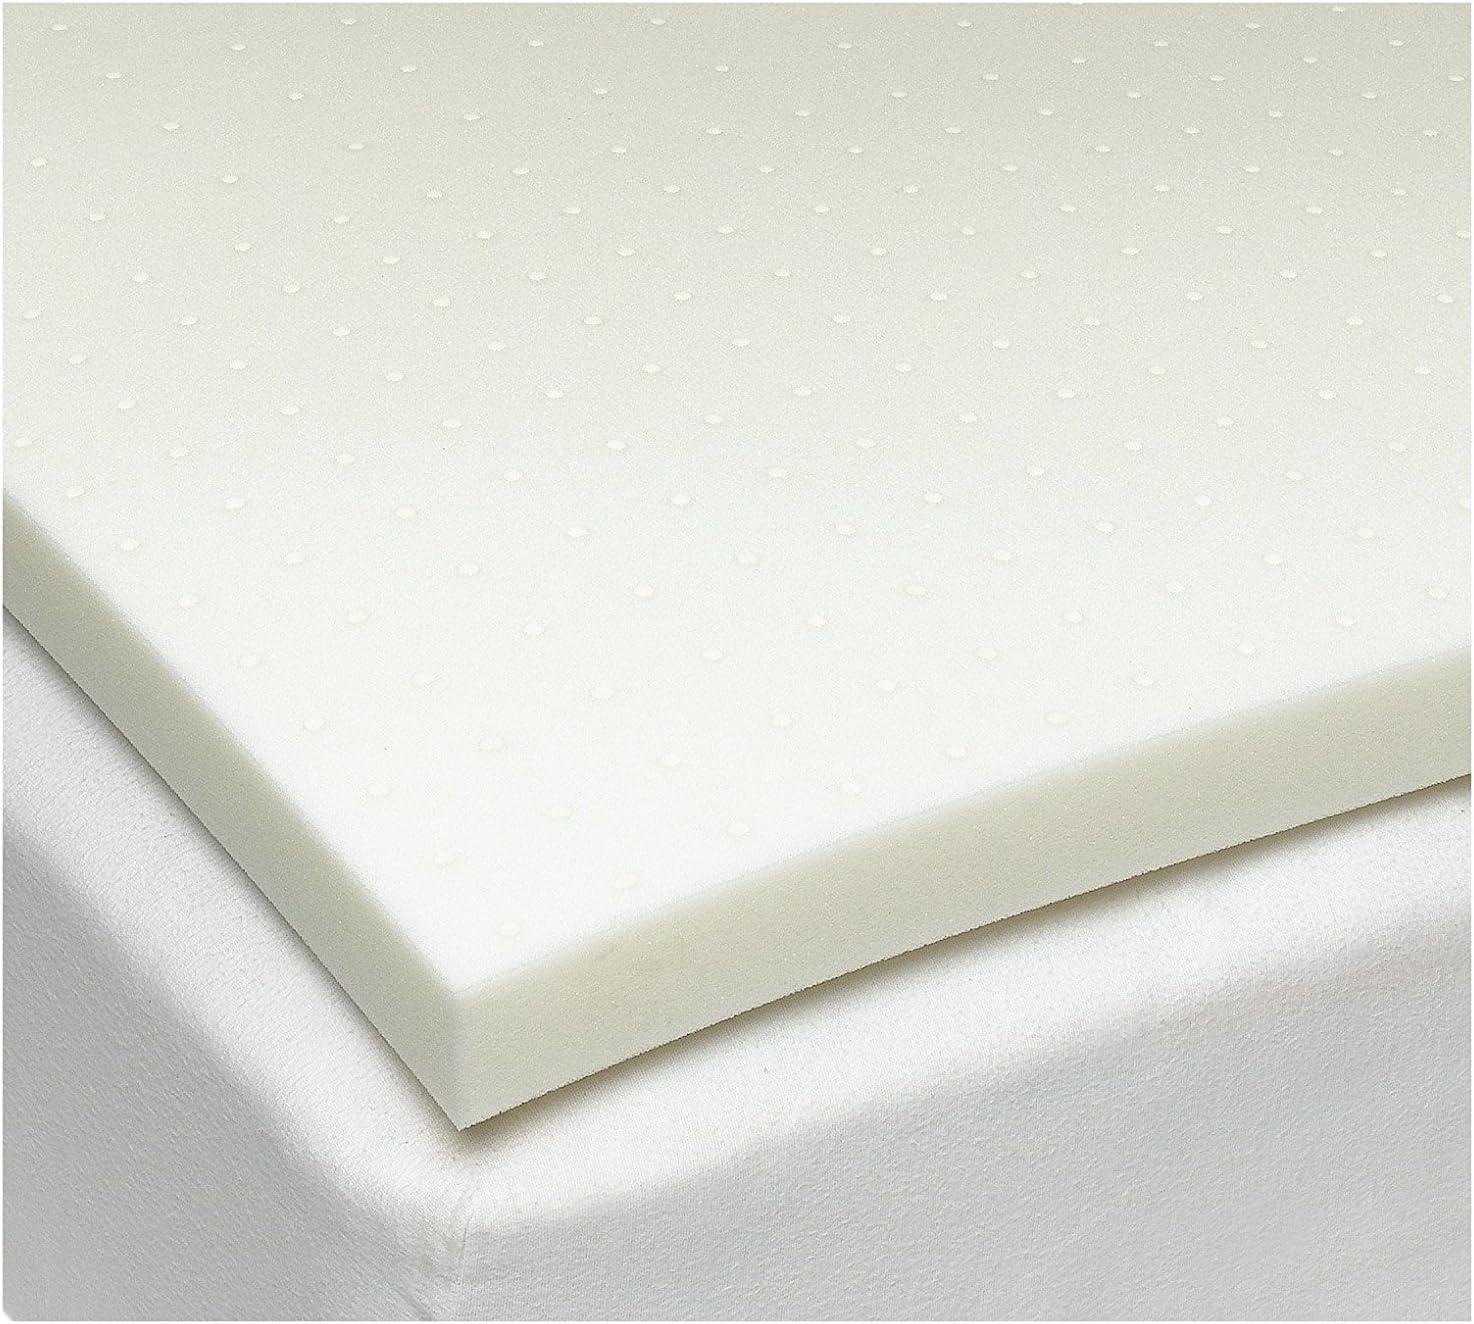 Sleep Joy 2 ViscO2 Ventilated Memory Foam Mattress Topper